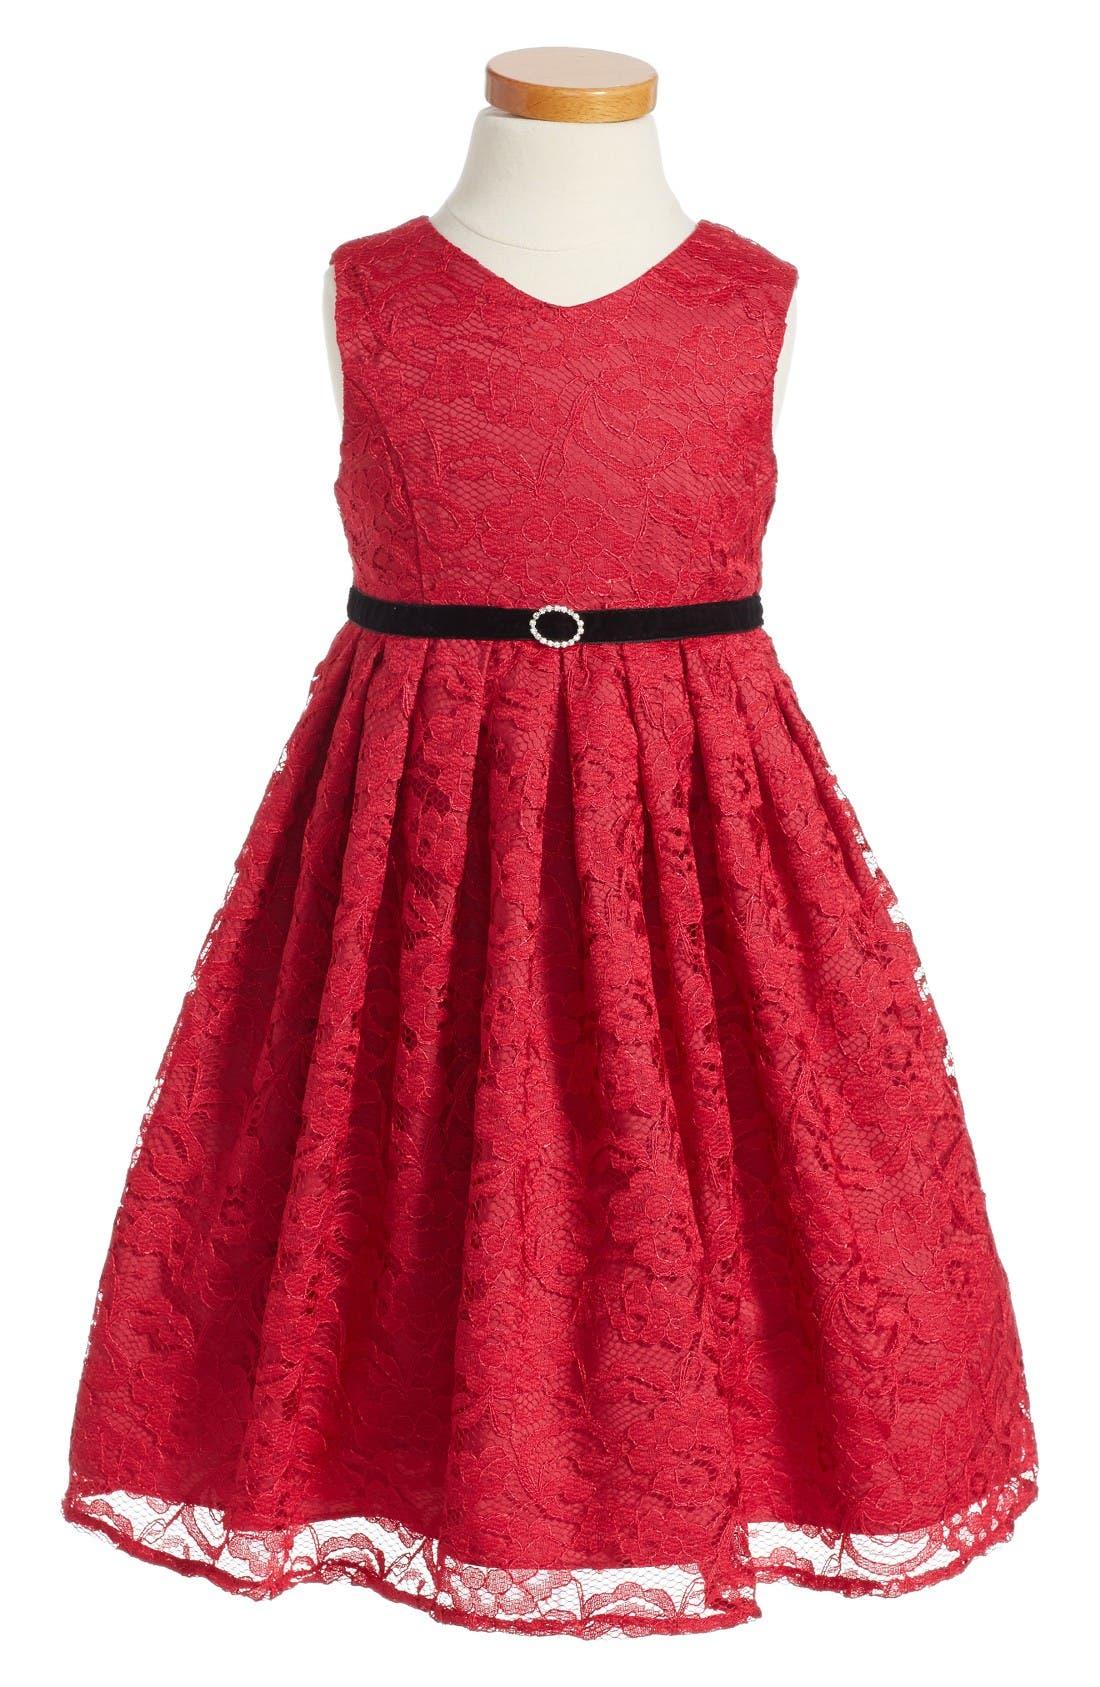 Alternate Image 1 Selected - Pippa & Julie Lace Empire Waist Dress (Toddler Girls, Little Girls and Big Girls)